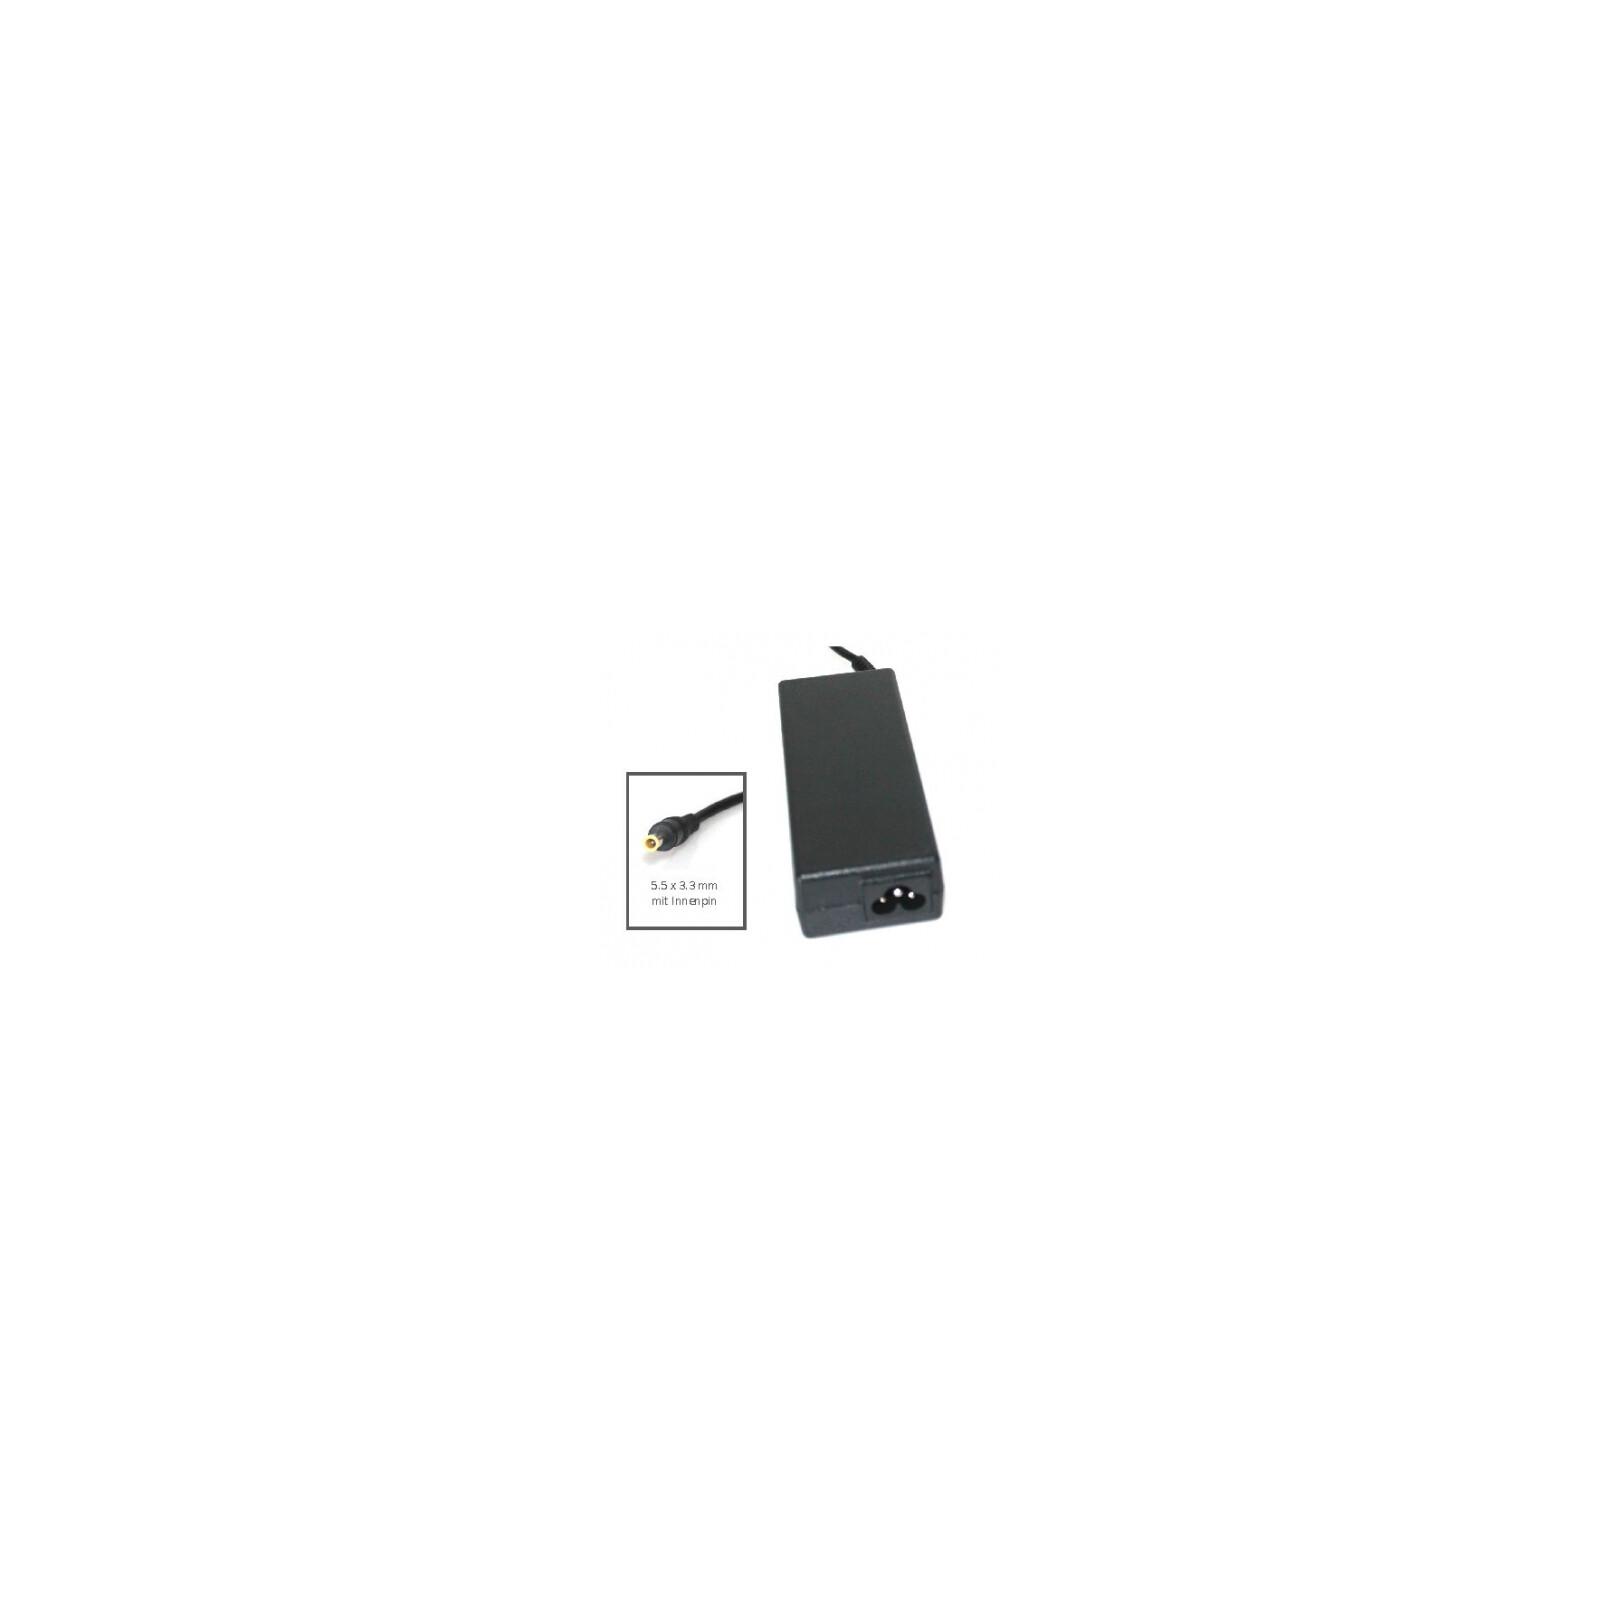 AGI Netzteil Samsung X11 90W